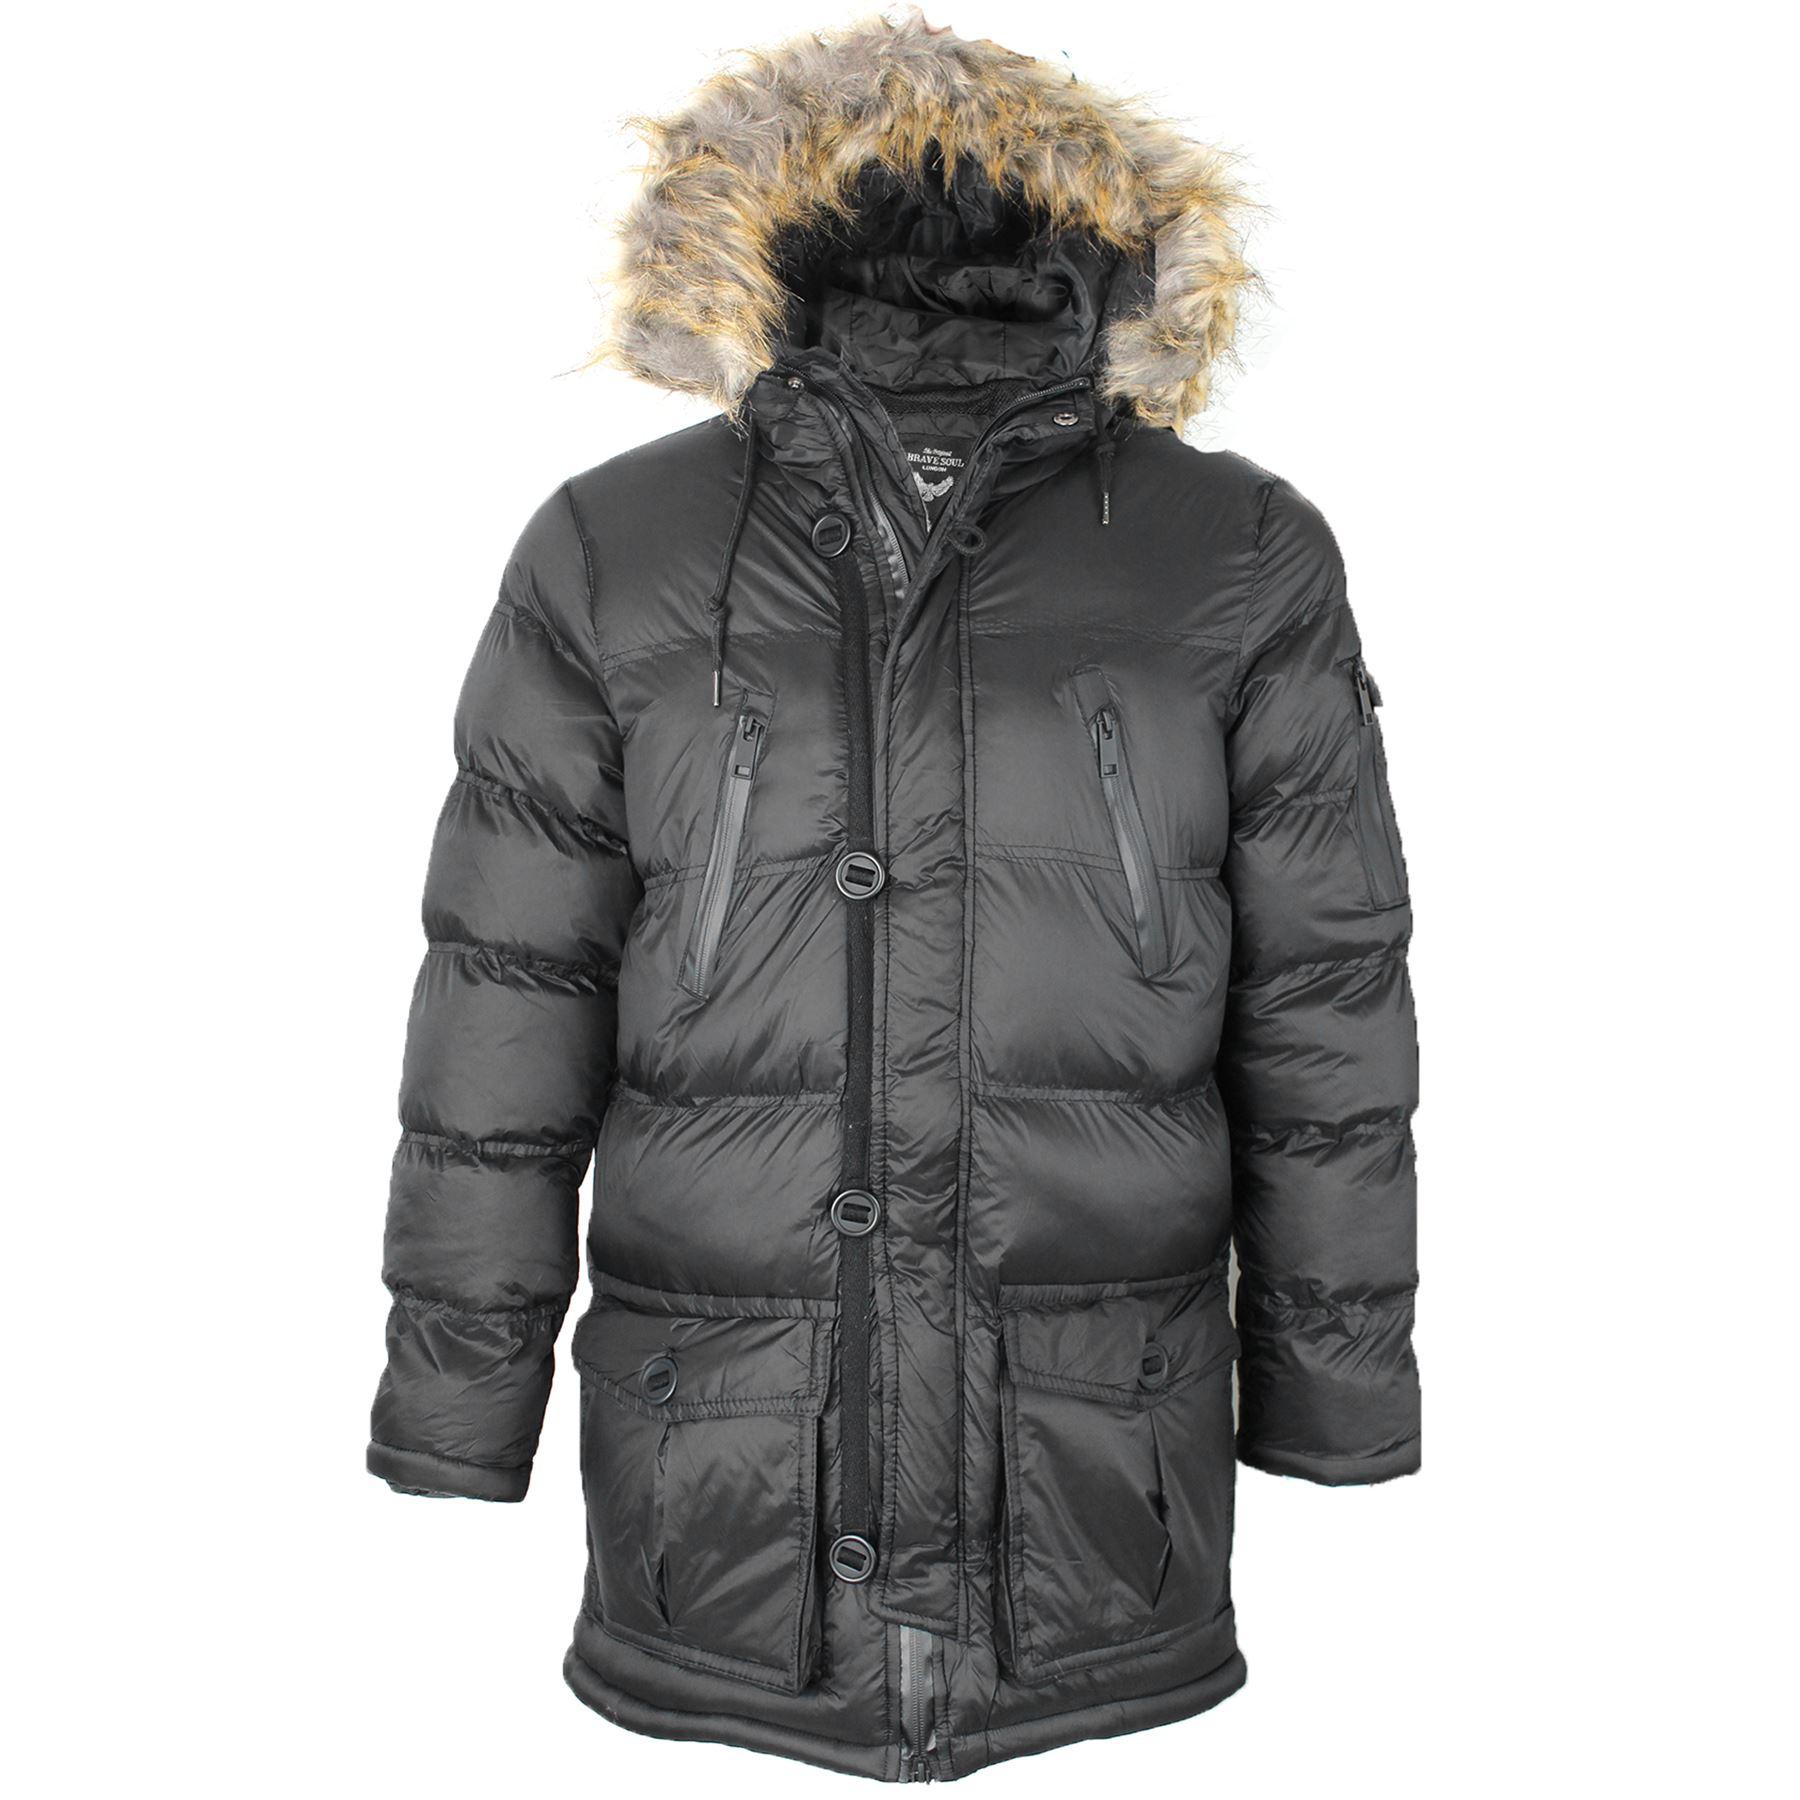 22d6cb3dfa70 Mens Brave Soul Padded Faux Fur Lined Hood Parka Jacket Winter ...